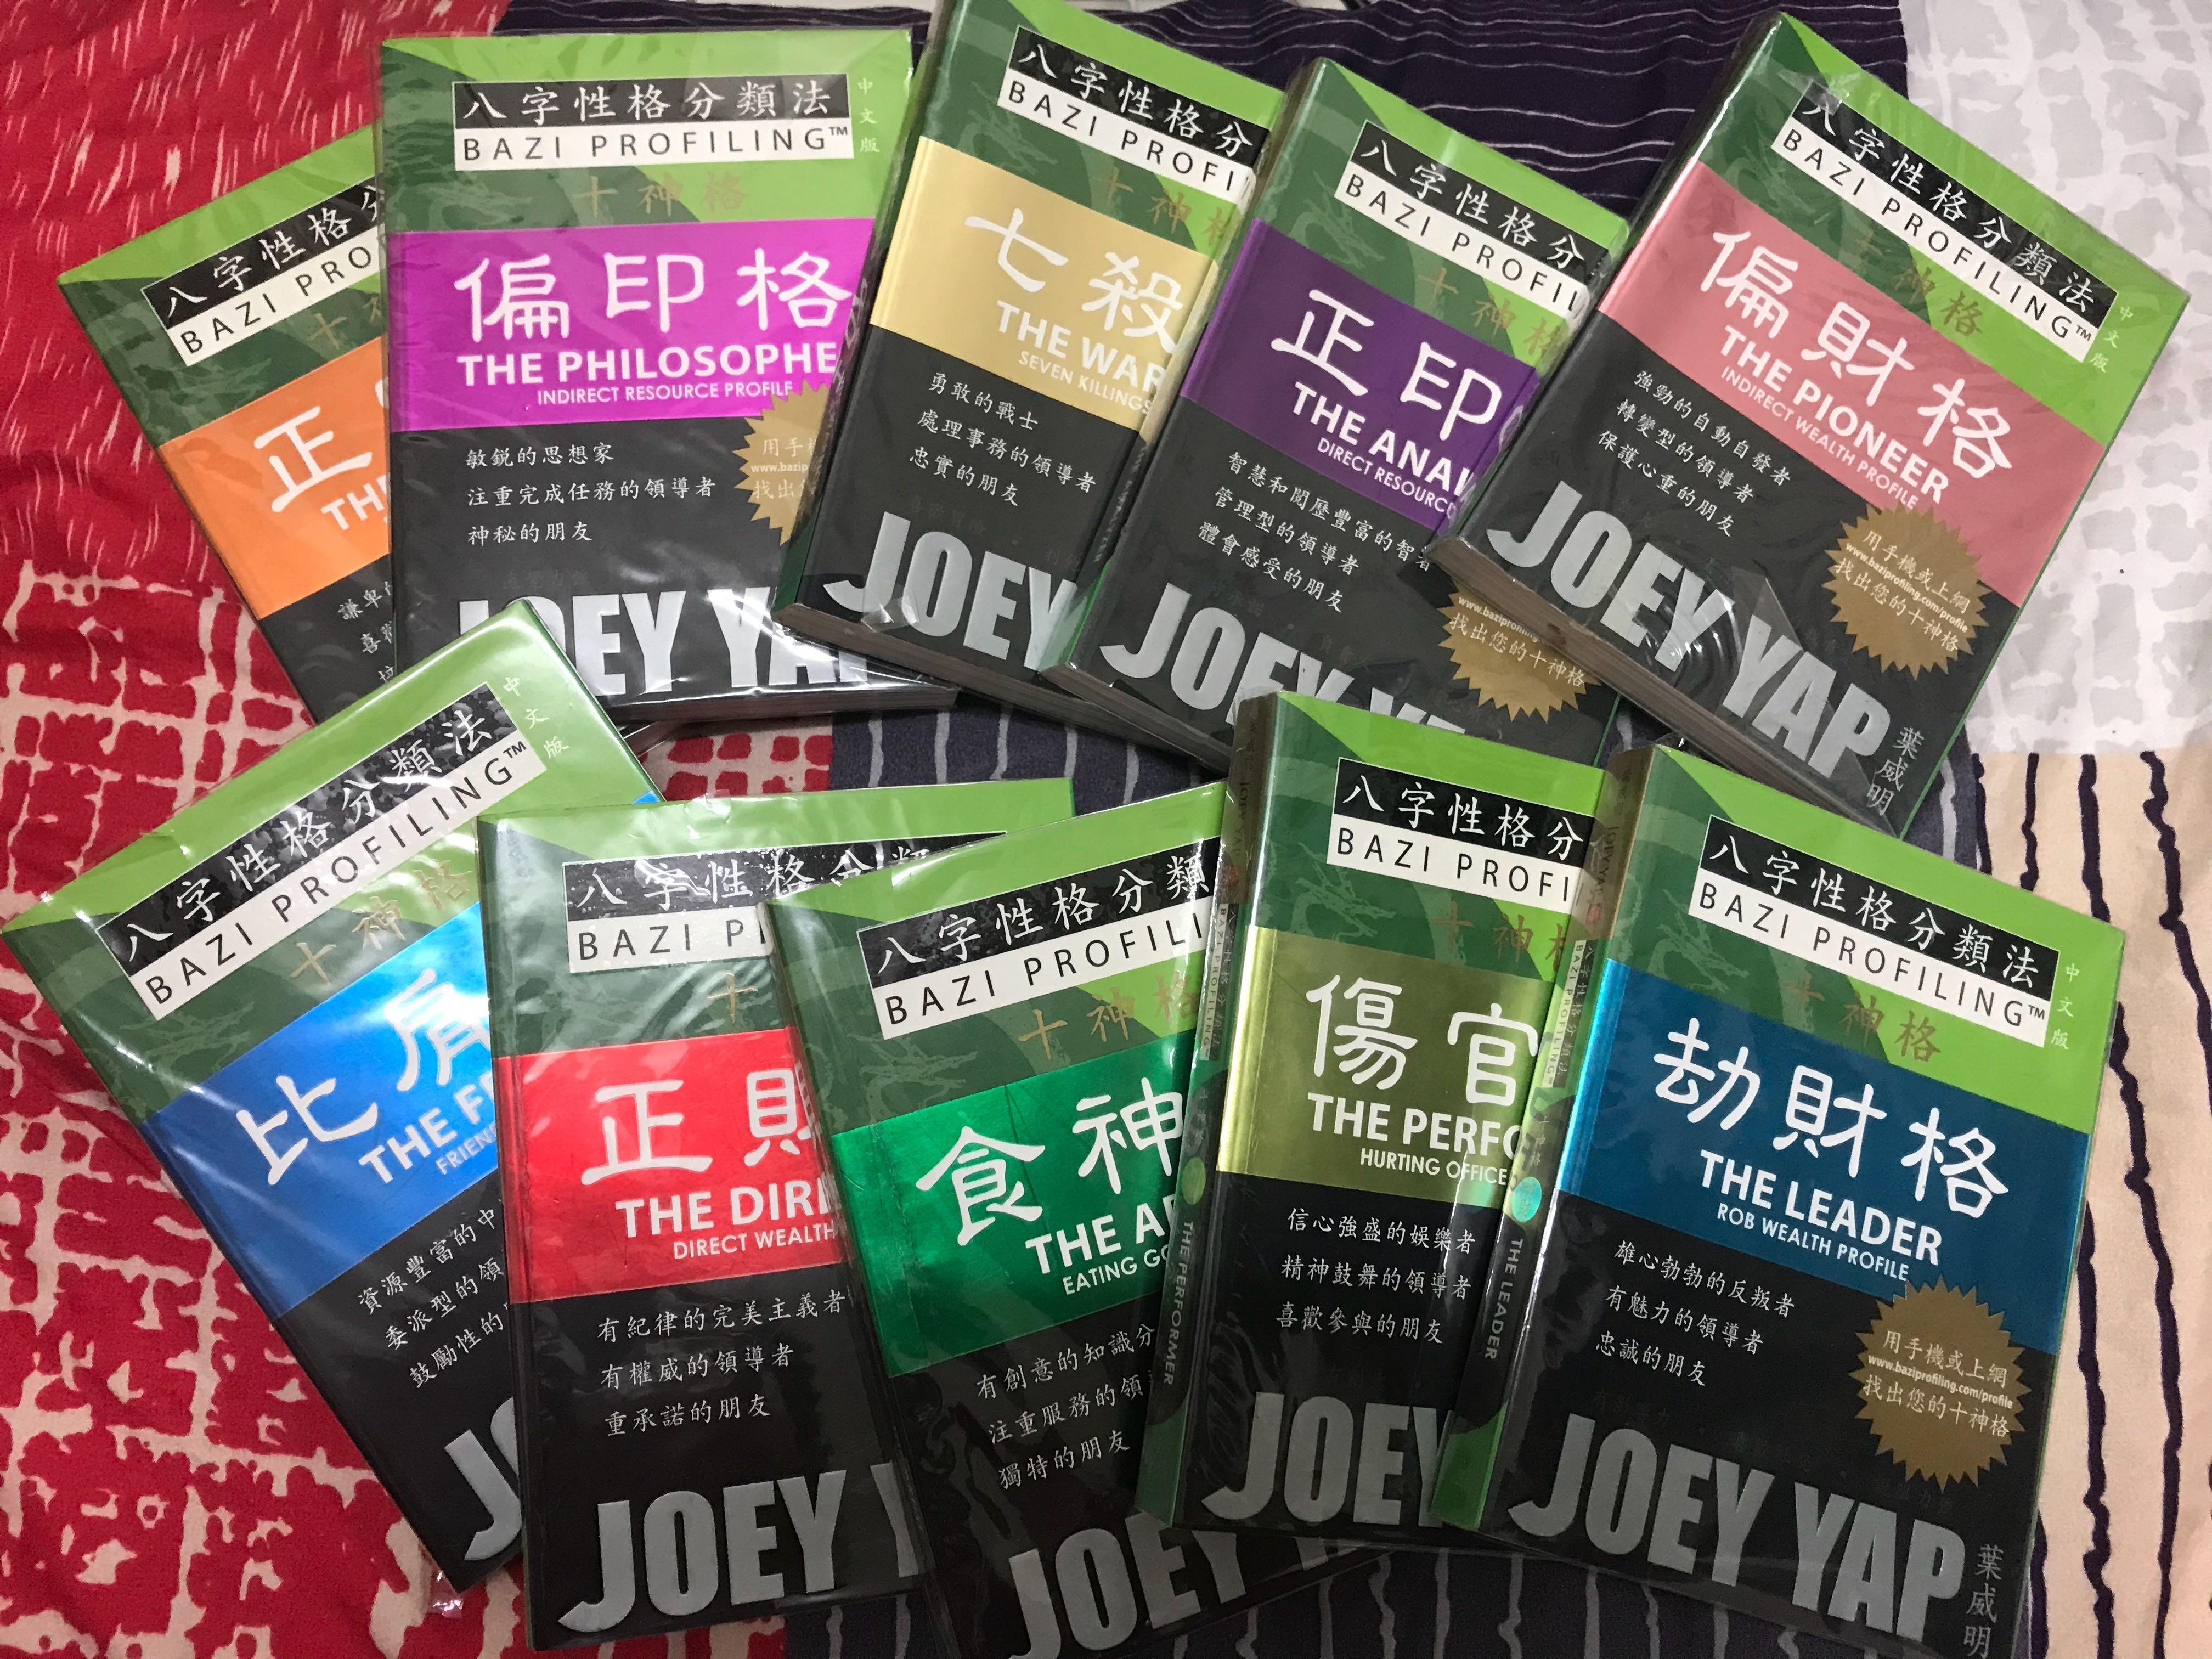 Joey Yap Bazi profiling full set